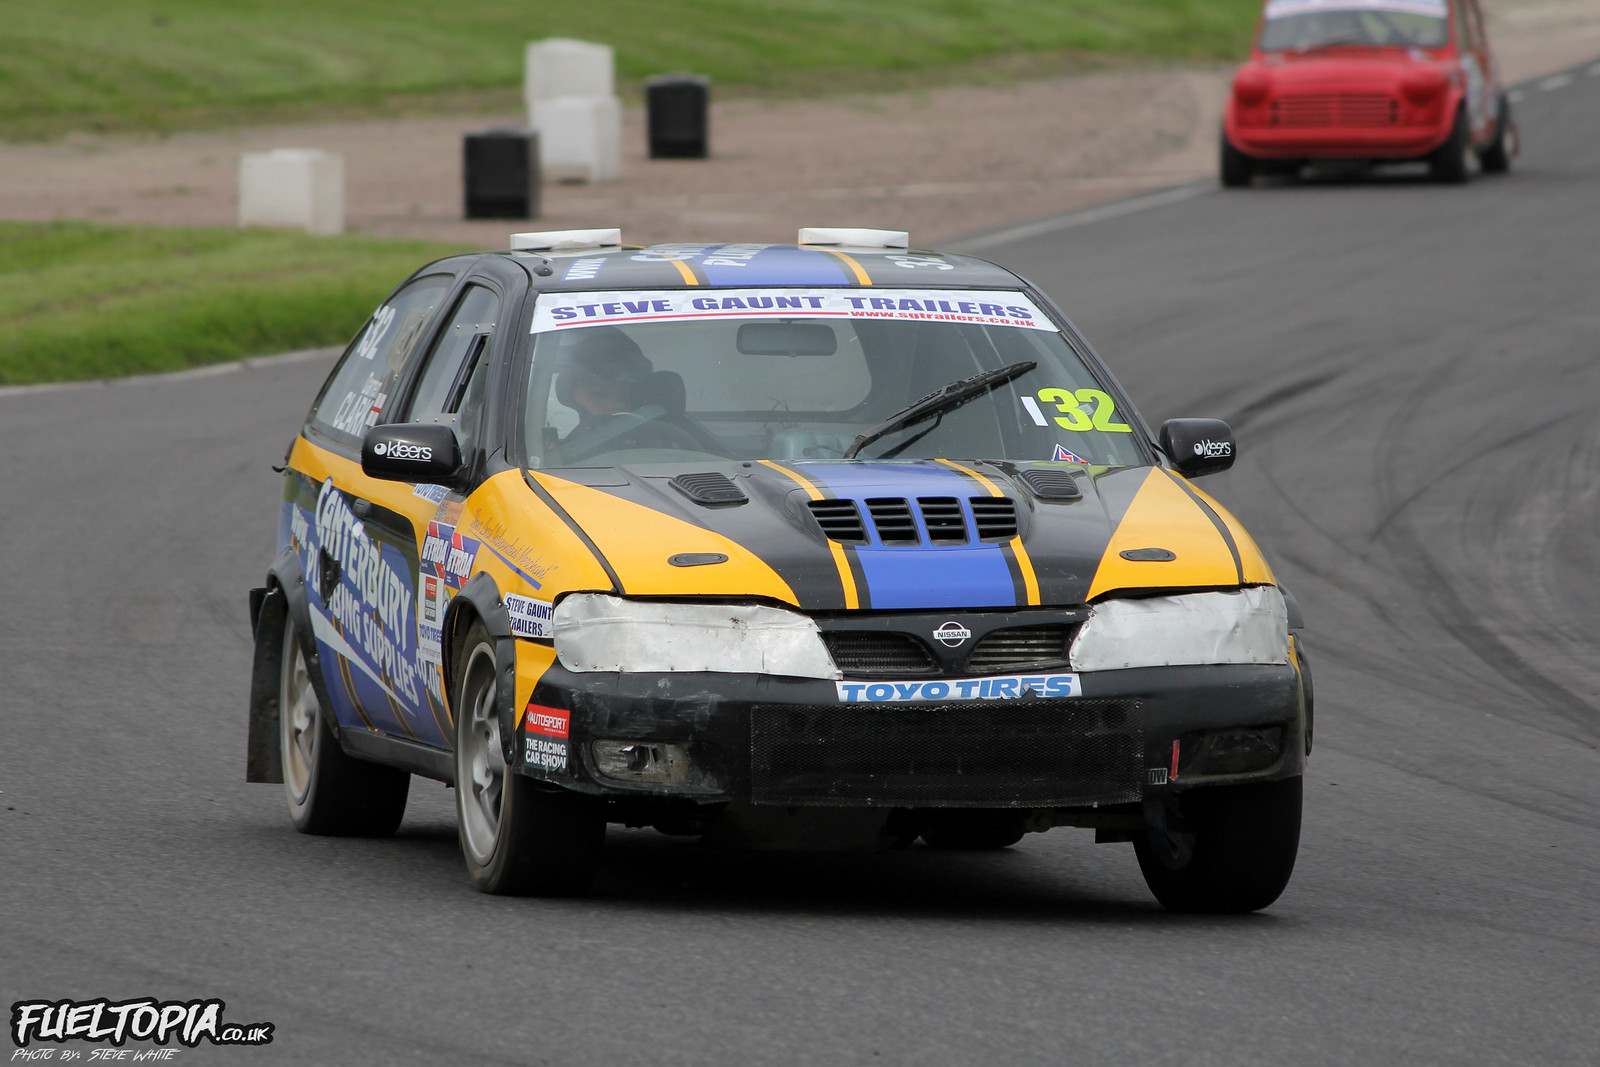 Darren Clark Nissan Almera Lydden Hill BTRDA Rallycross Championship 2018 Steve White Fueltopia